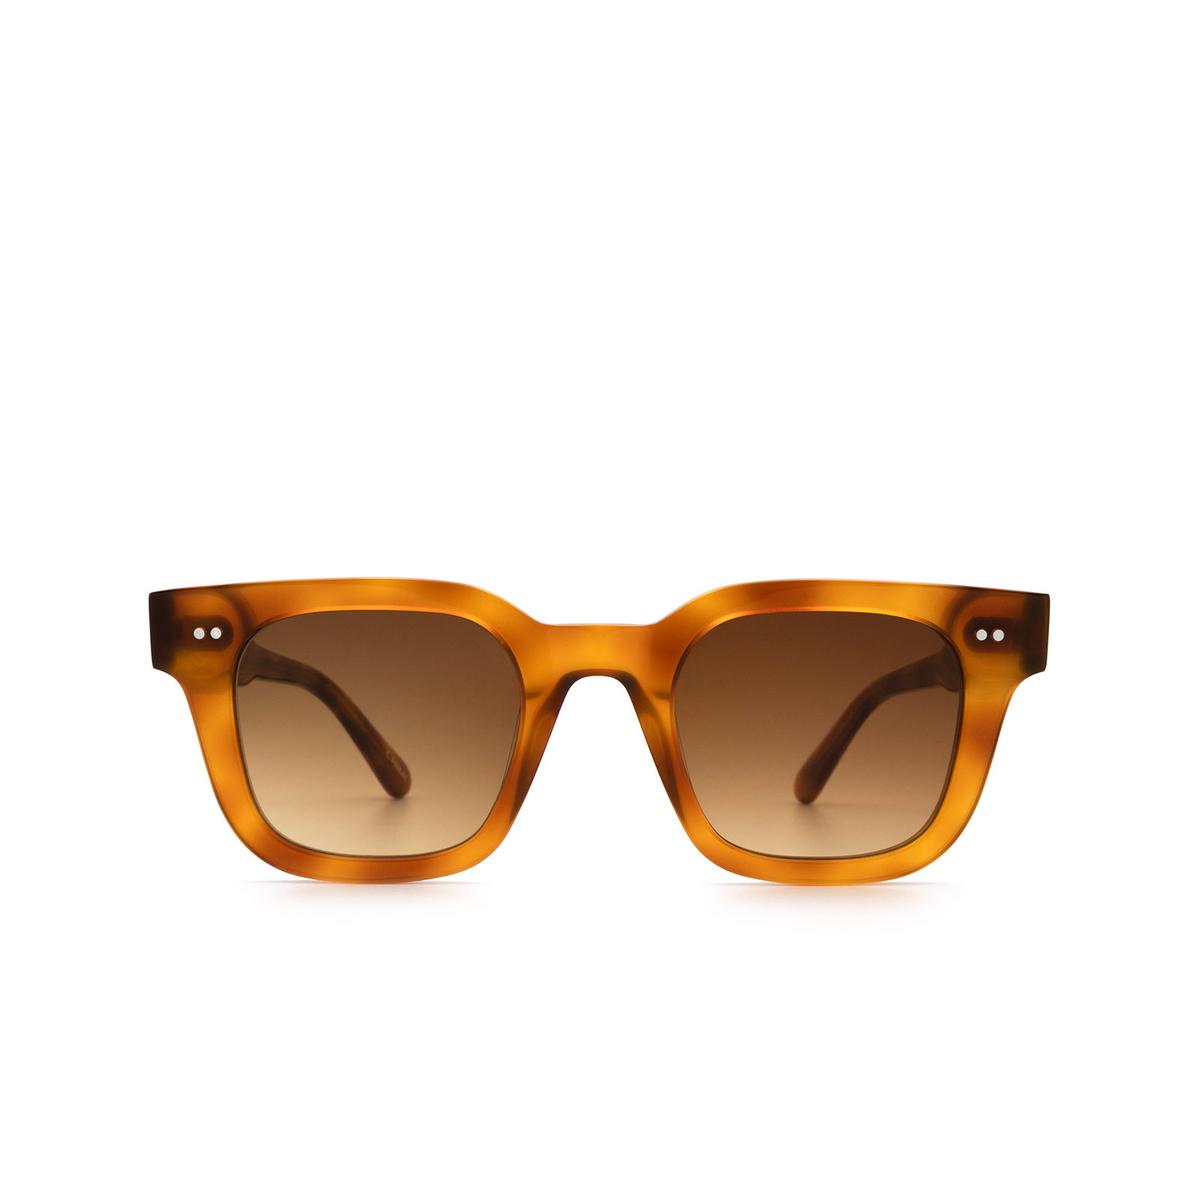 Chimi® Square Sunglasses: 04 color Havana - front view.